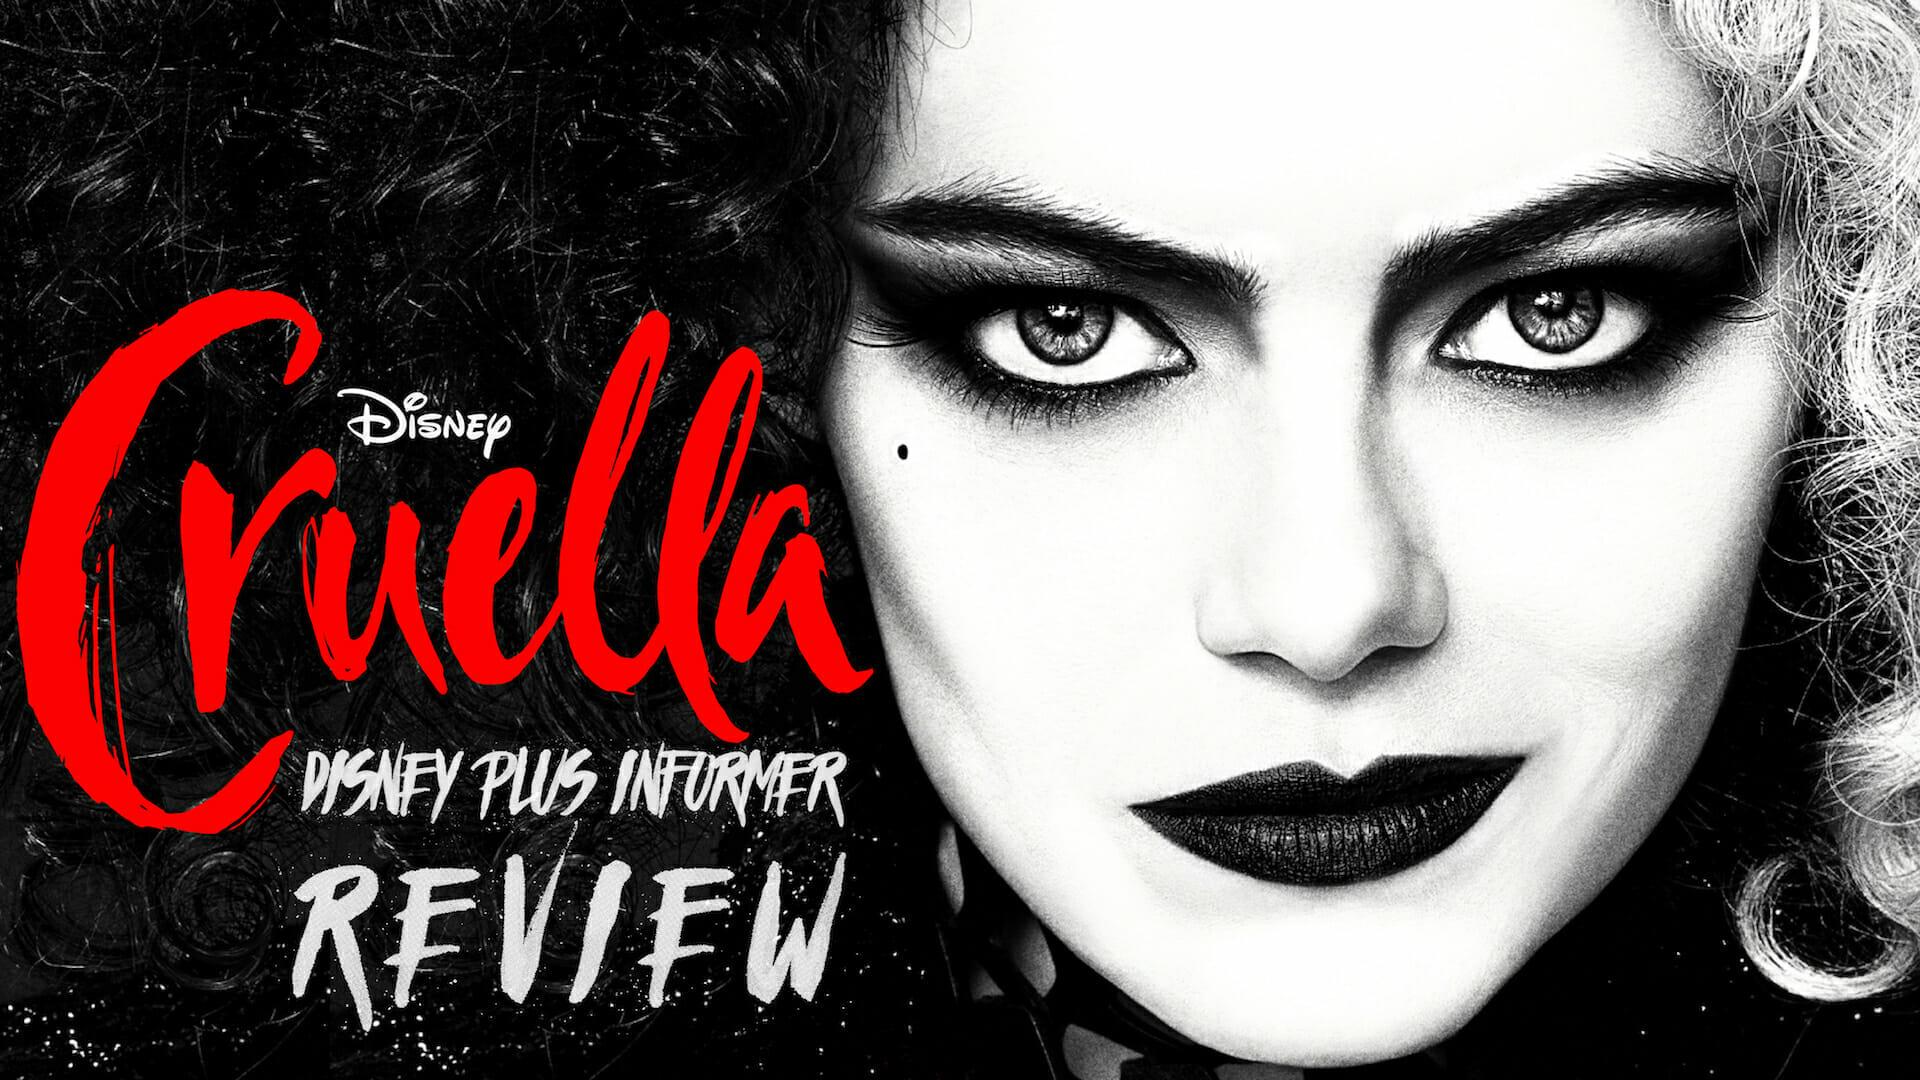 Cruella Review: Emmas Stone & Thompson Deliver Slick Performances in 70's Glam Punk Retelling of Disney's Fur-crazed Villainess Cruella deVil